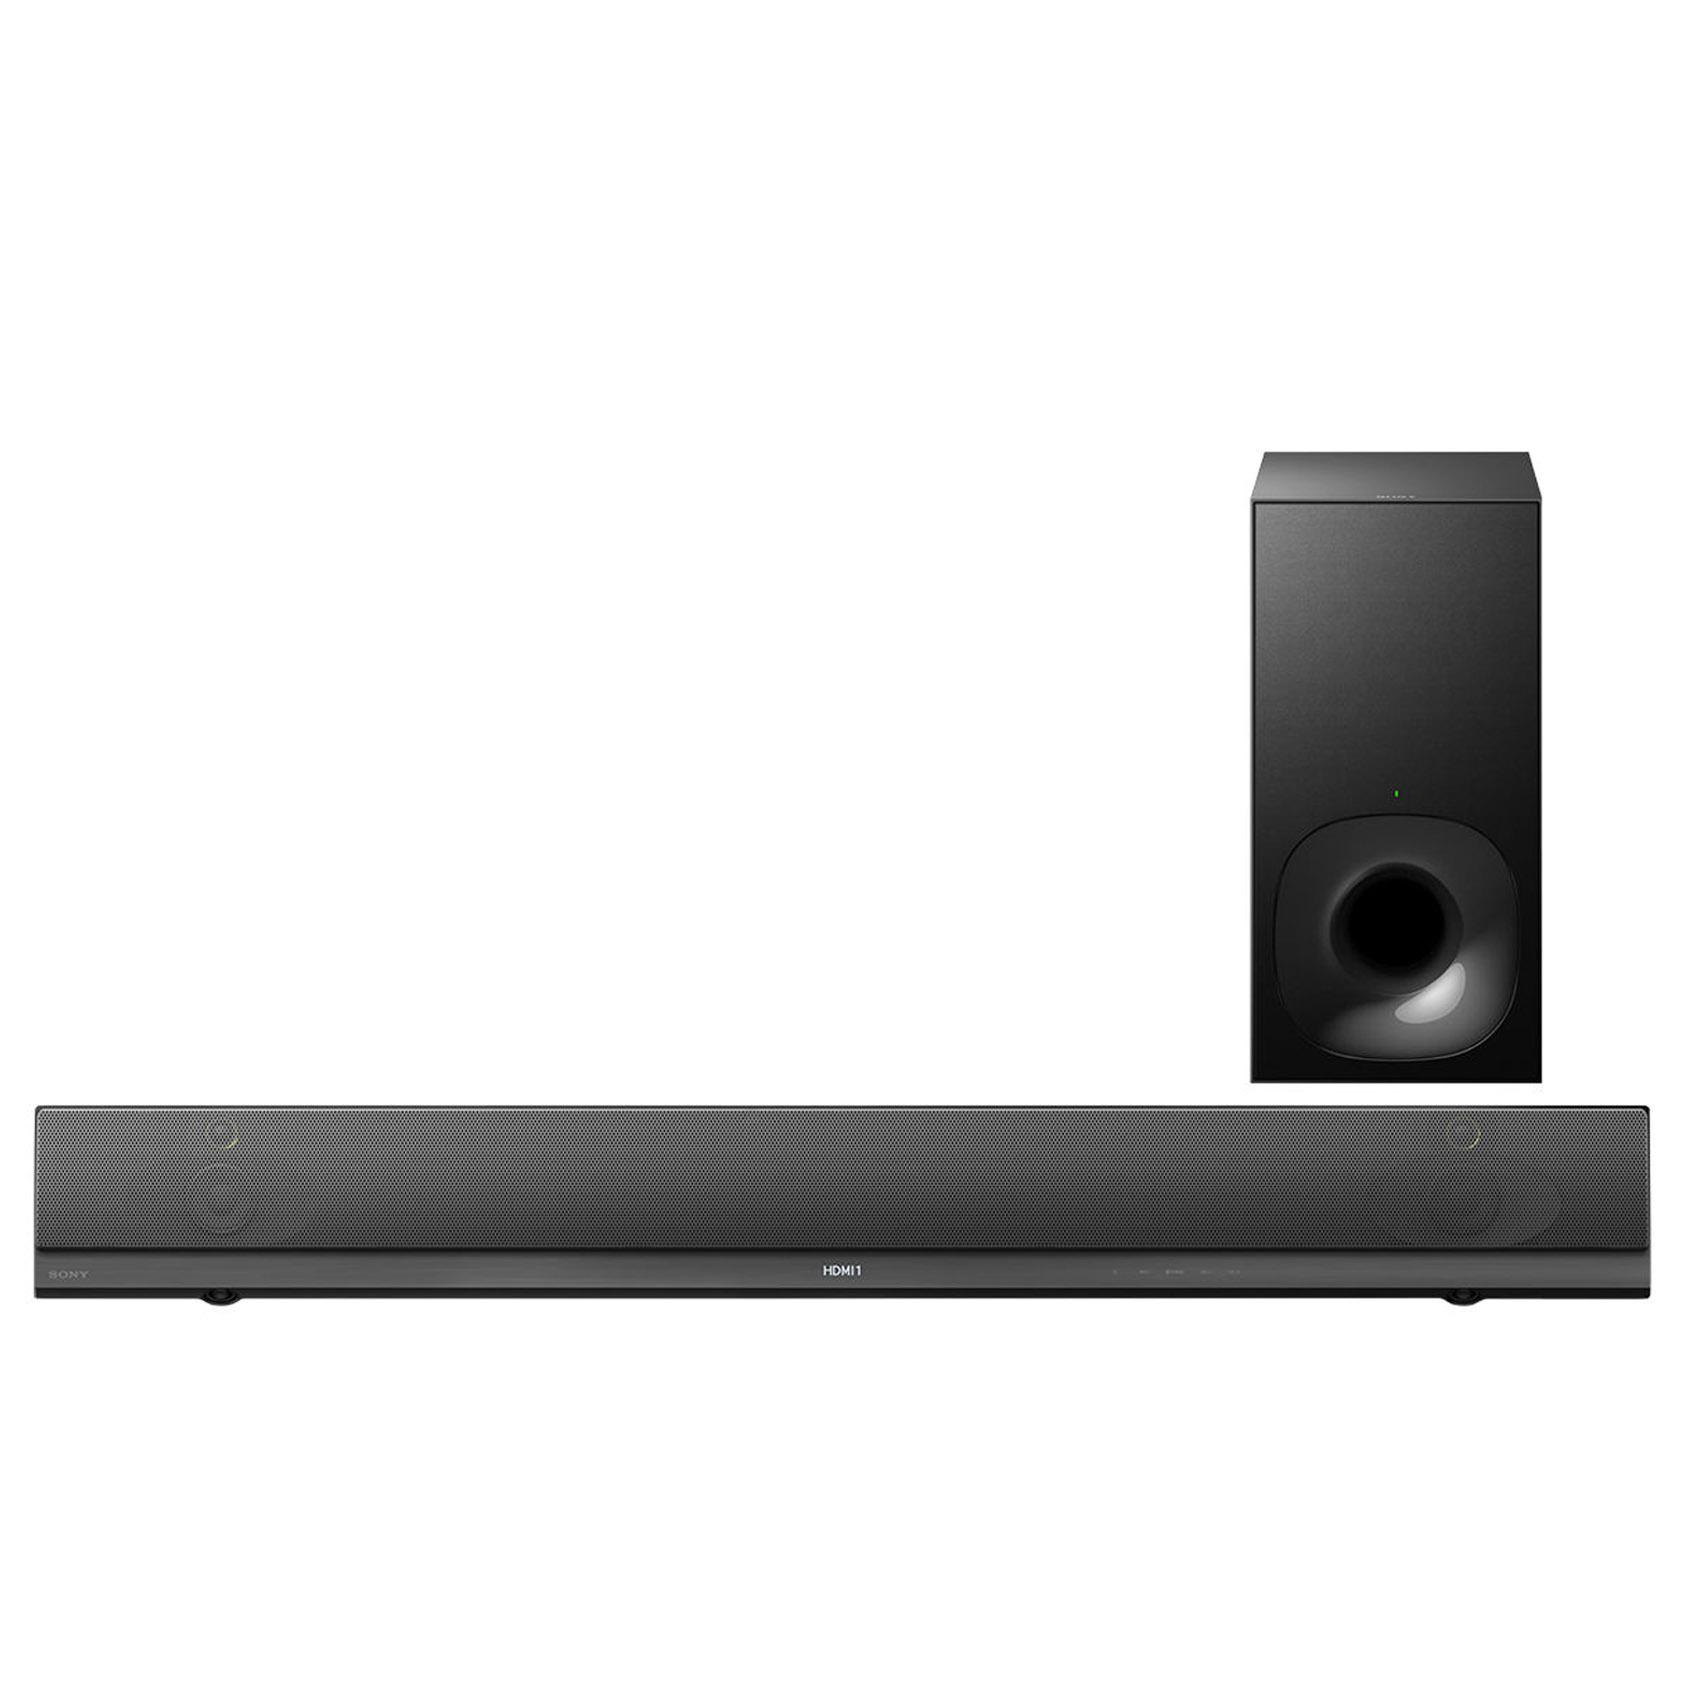 buy sony soundbar htnt5 online in uae carrefour uae